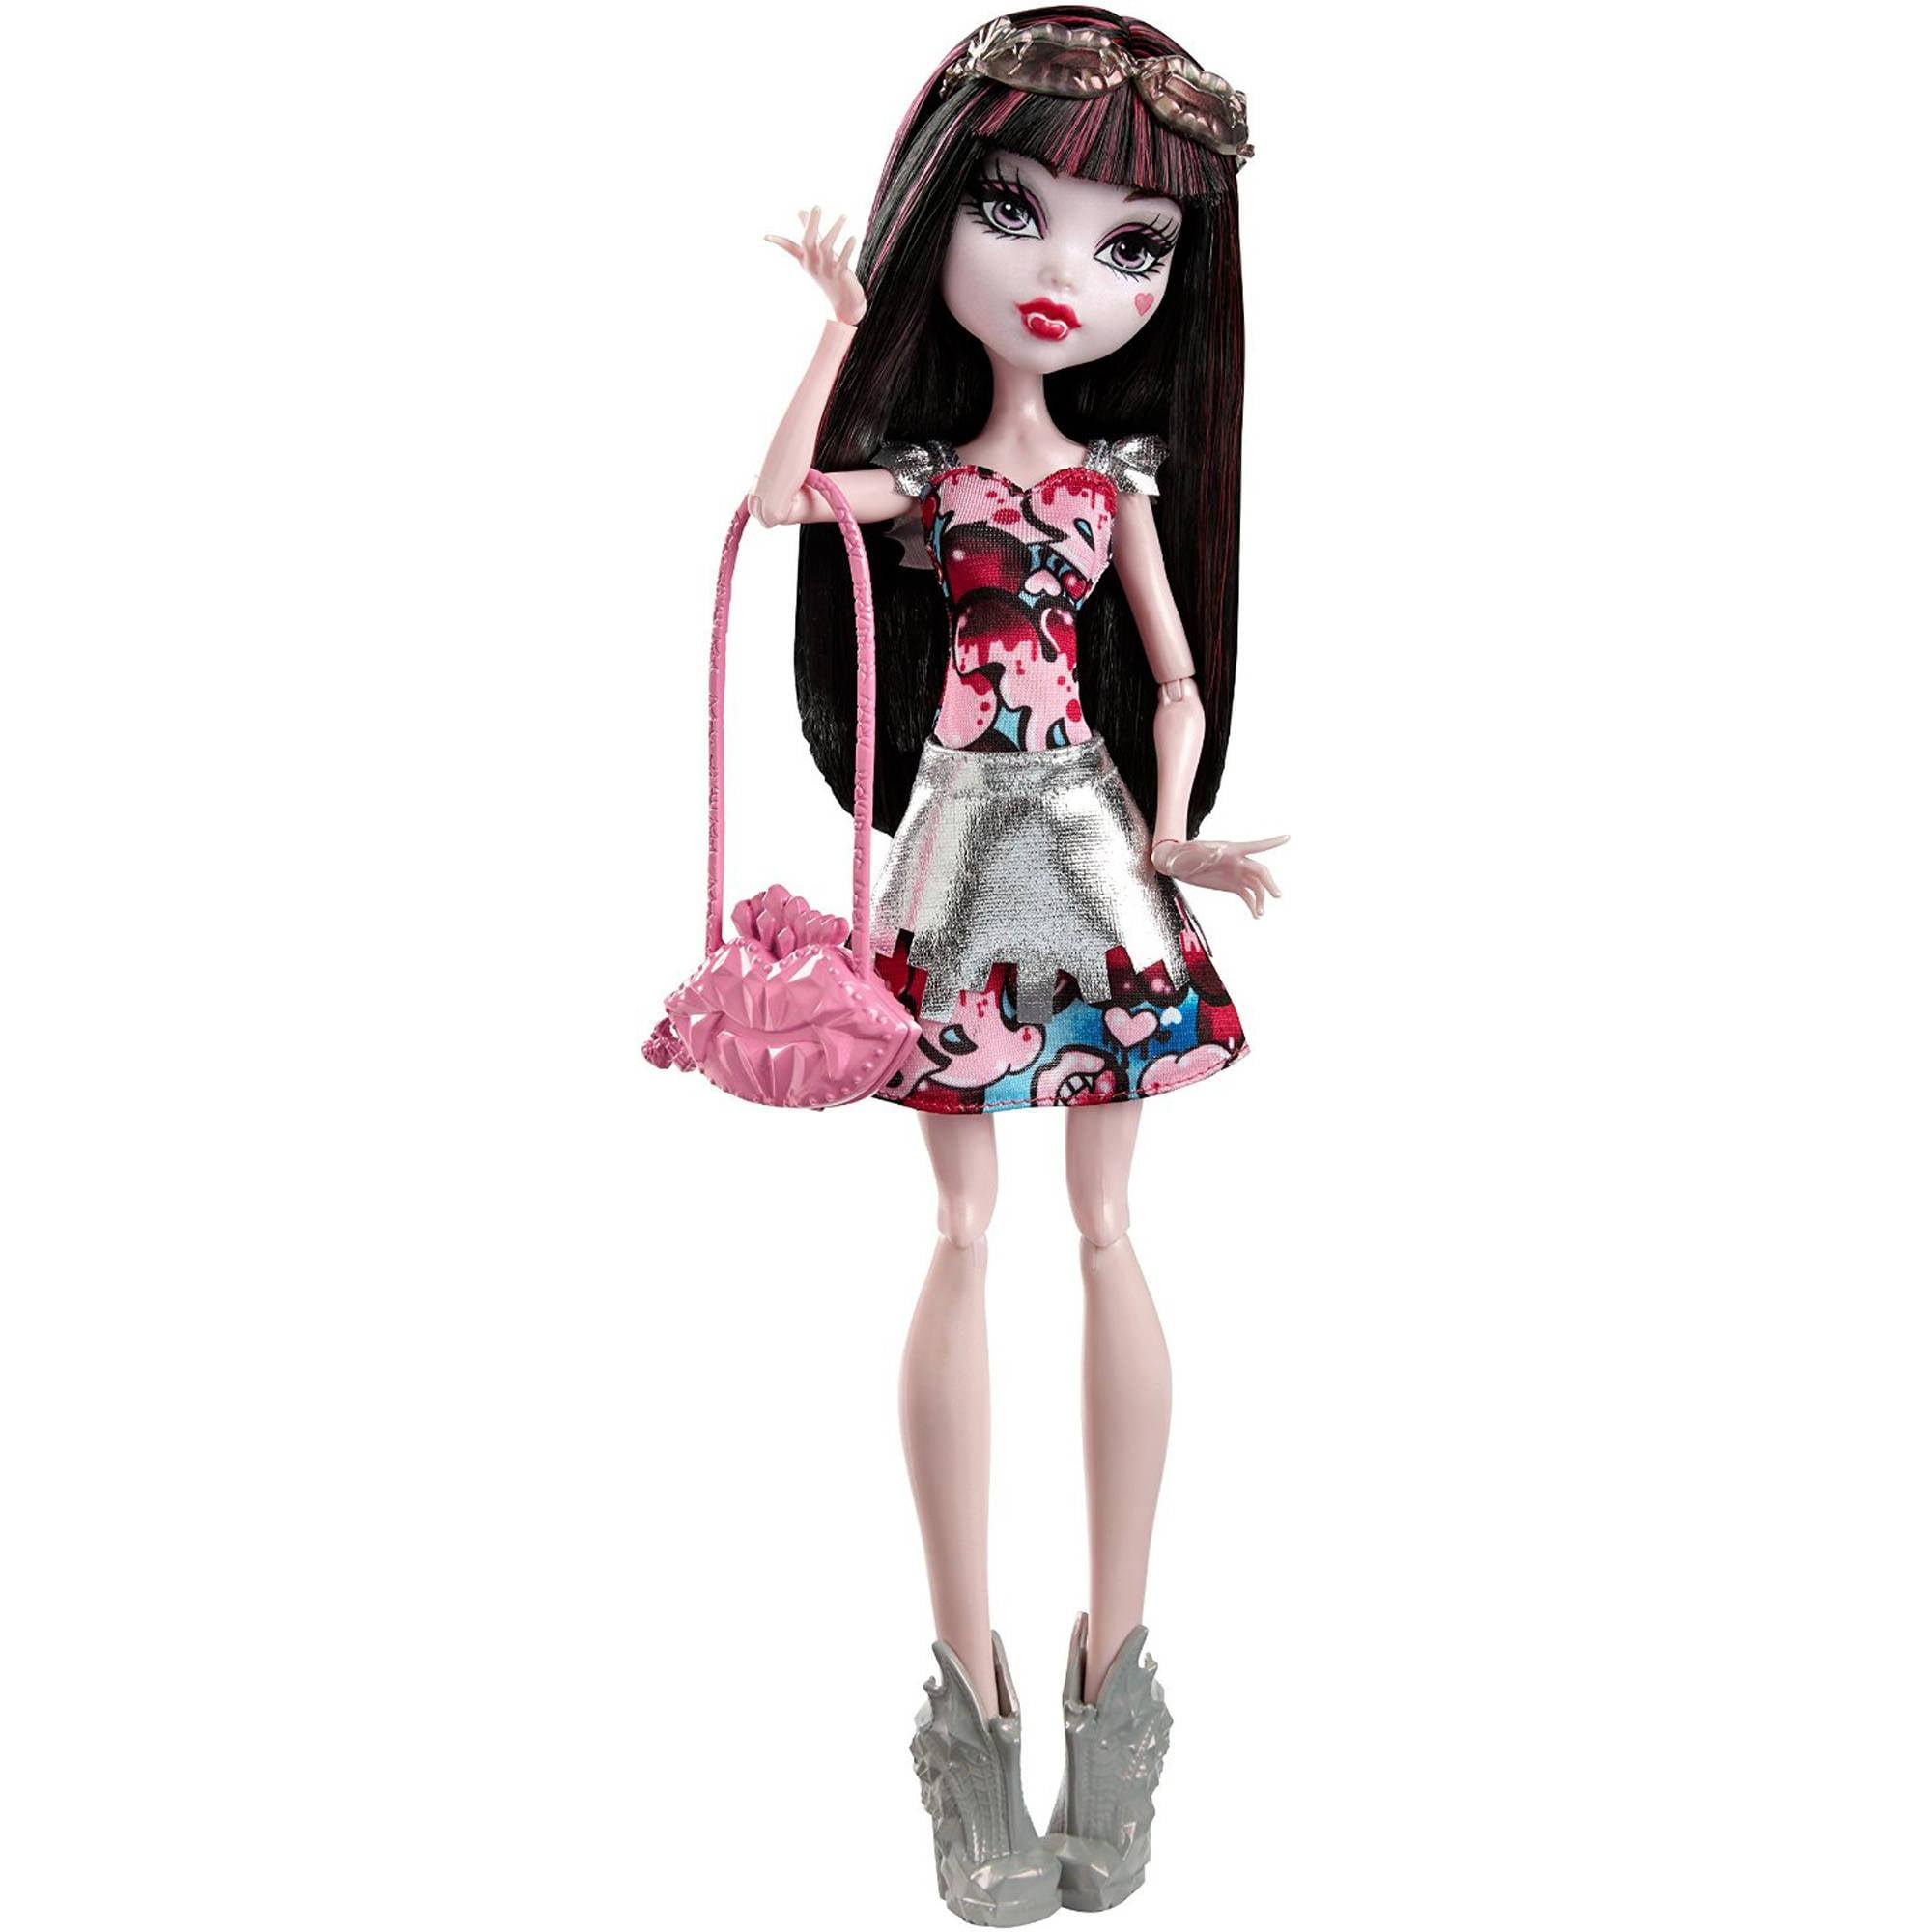 Monster High Boo York, Boo York Frightseers Draculaura Doll by Mattel